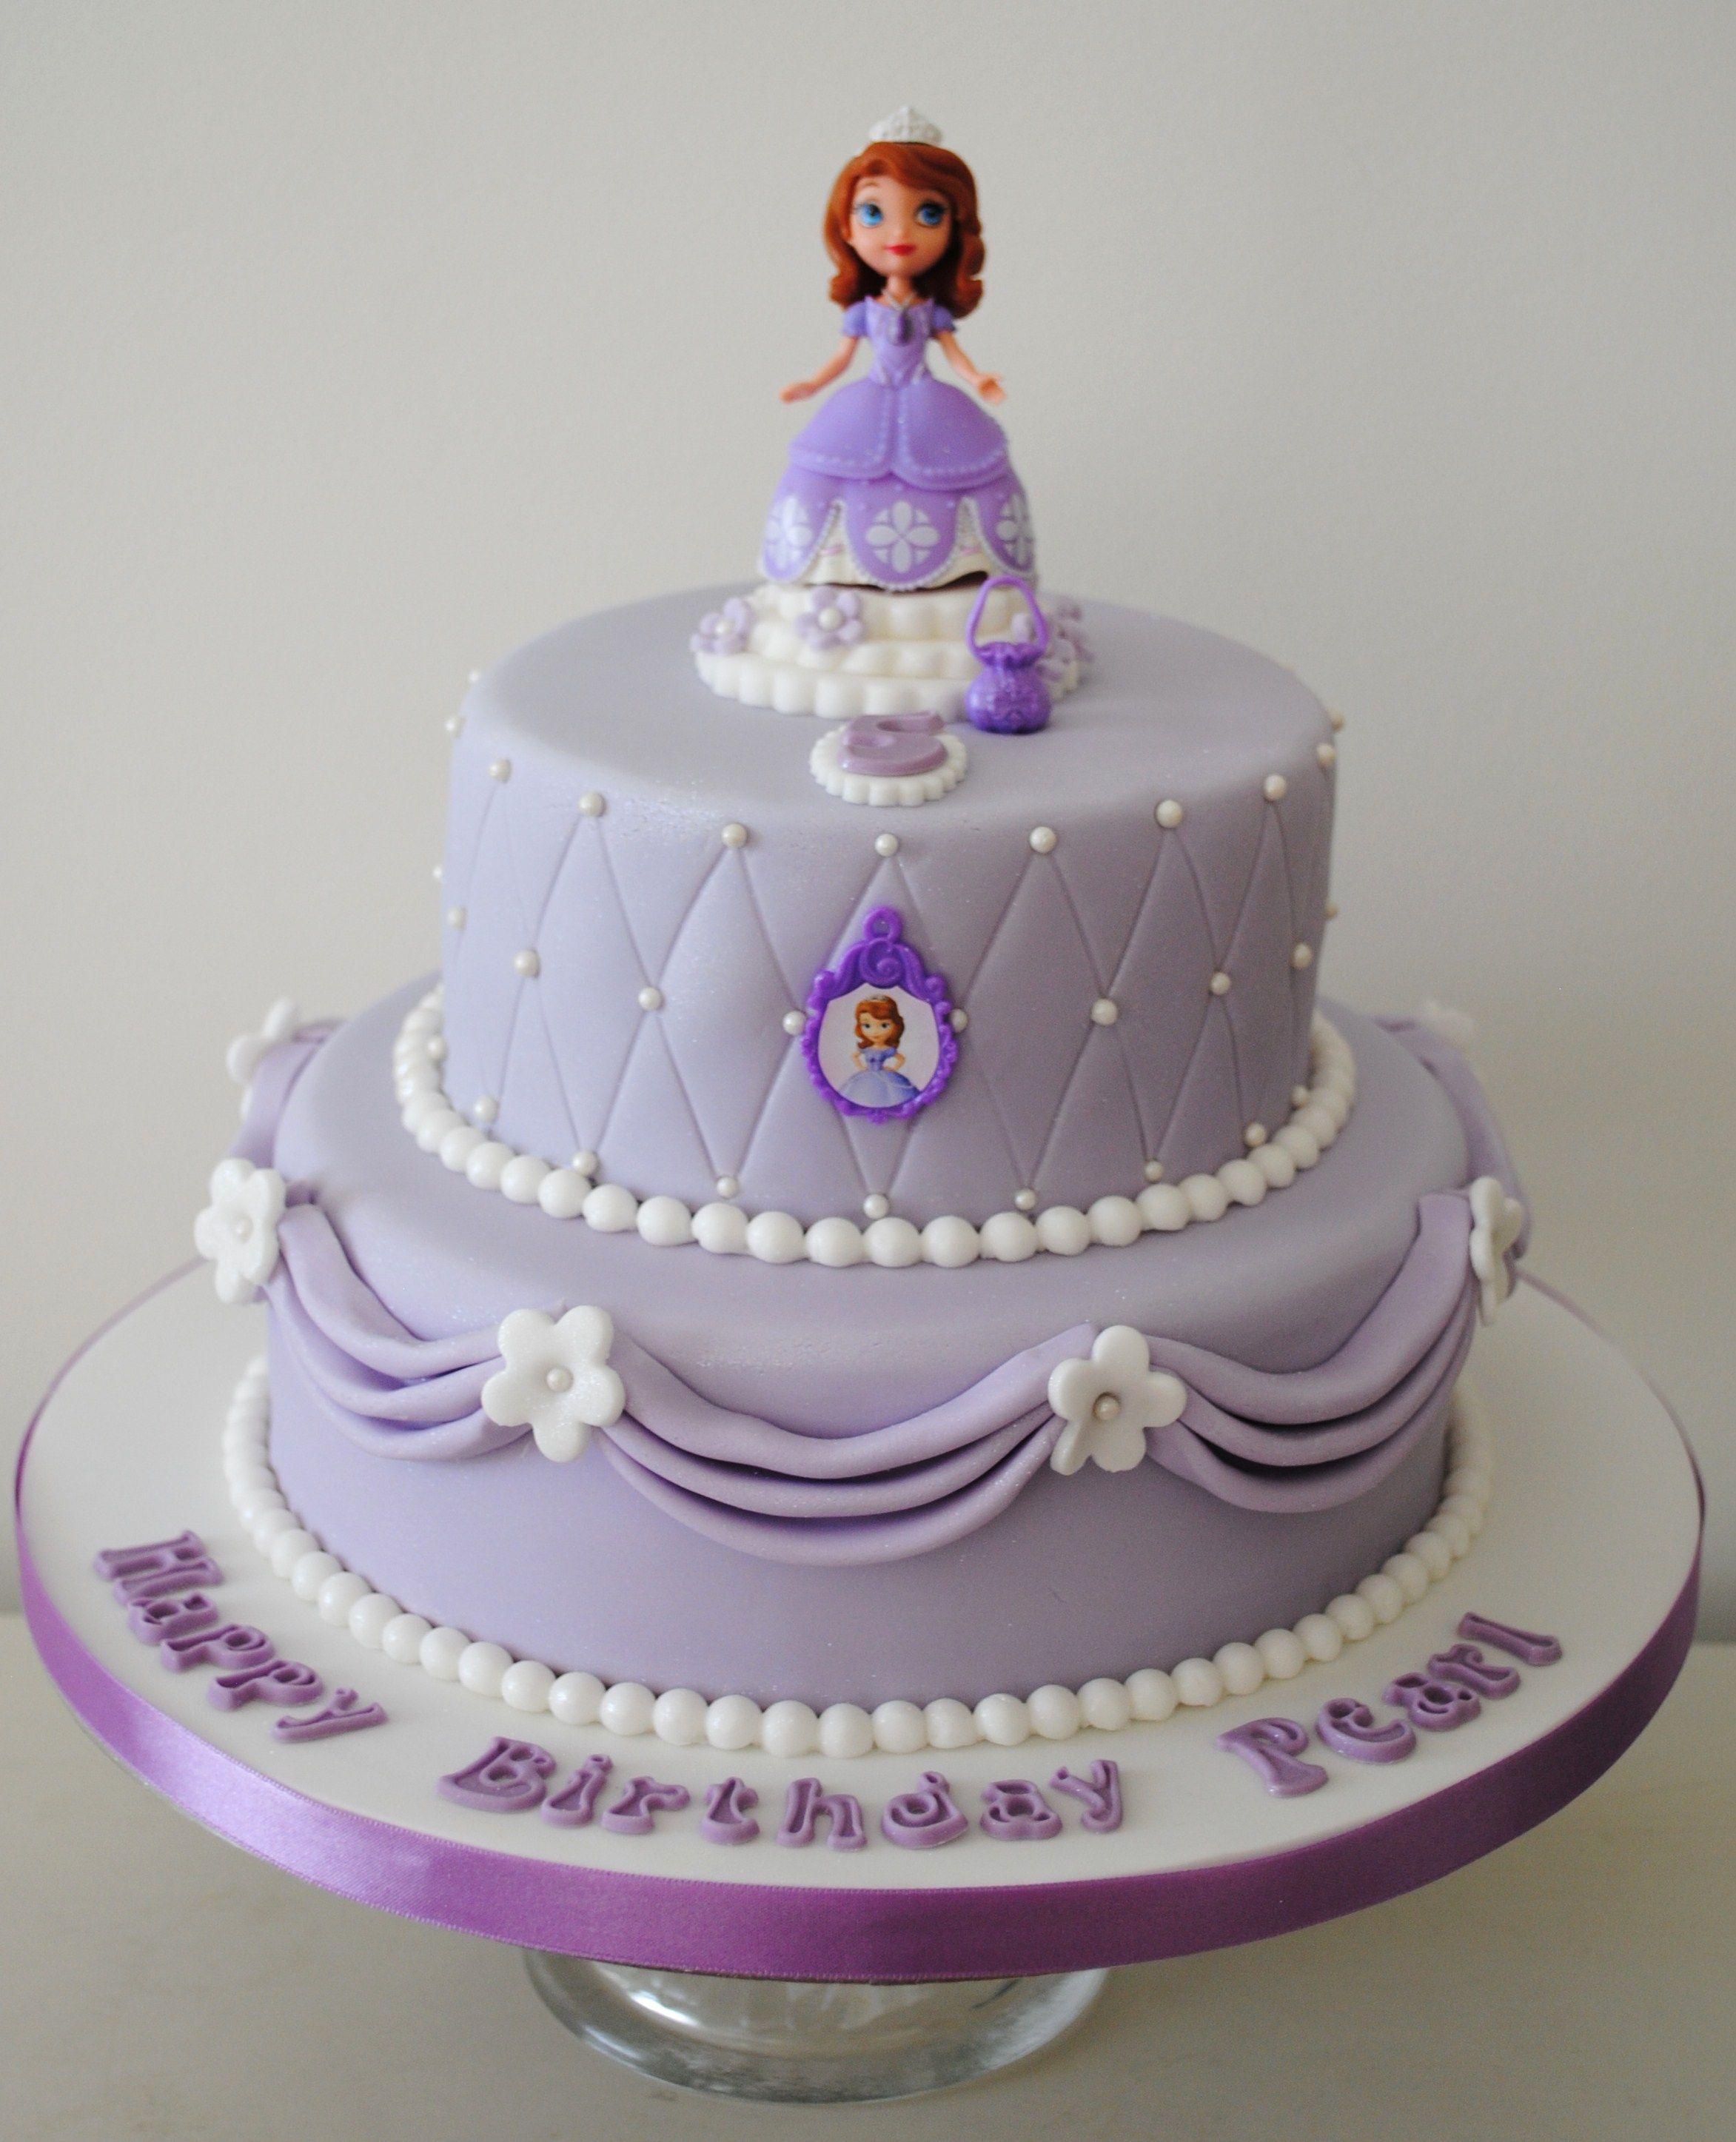 Sofia the First Birthday Cake Ideas Sofia birthday cake